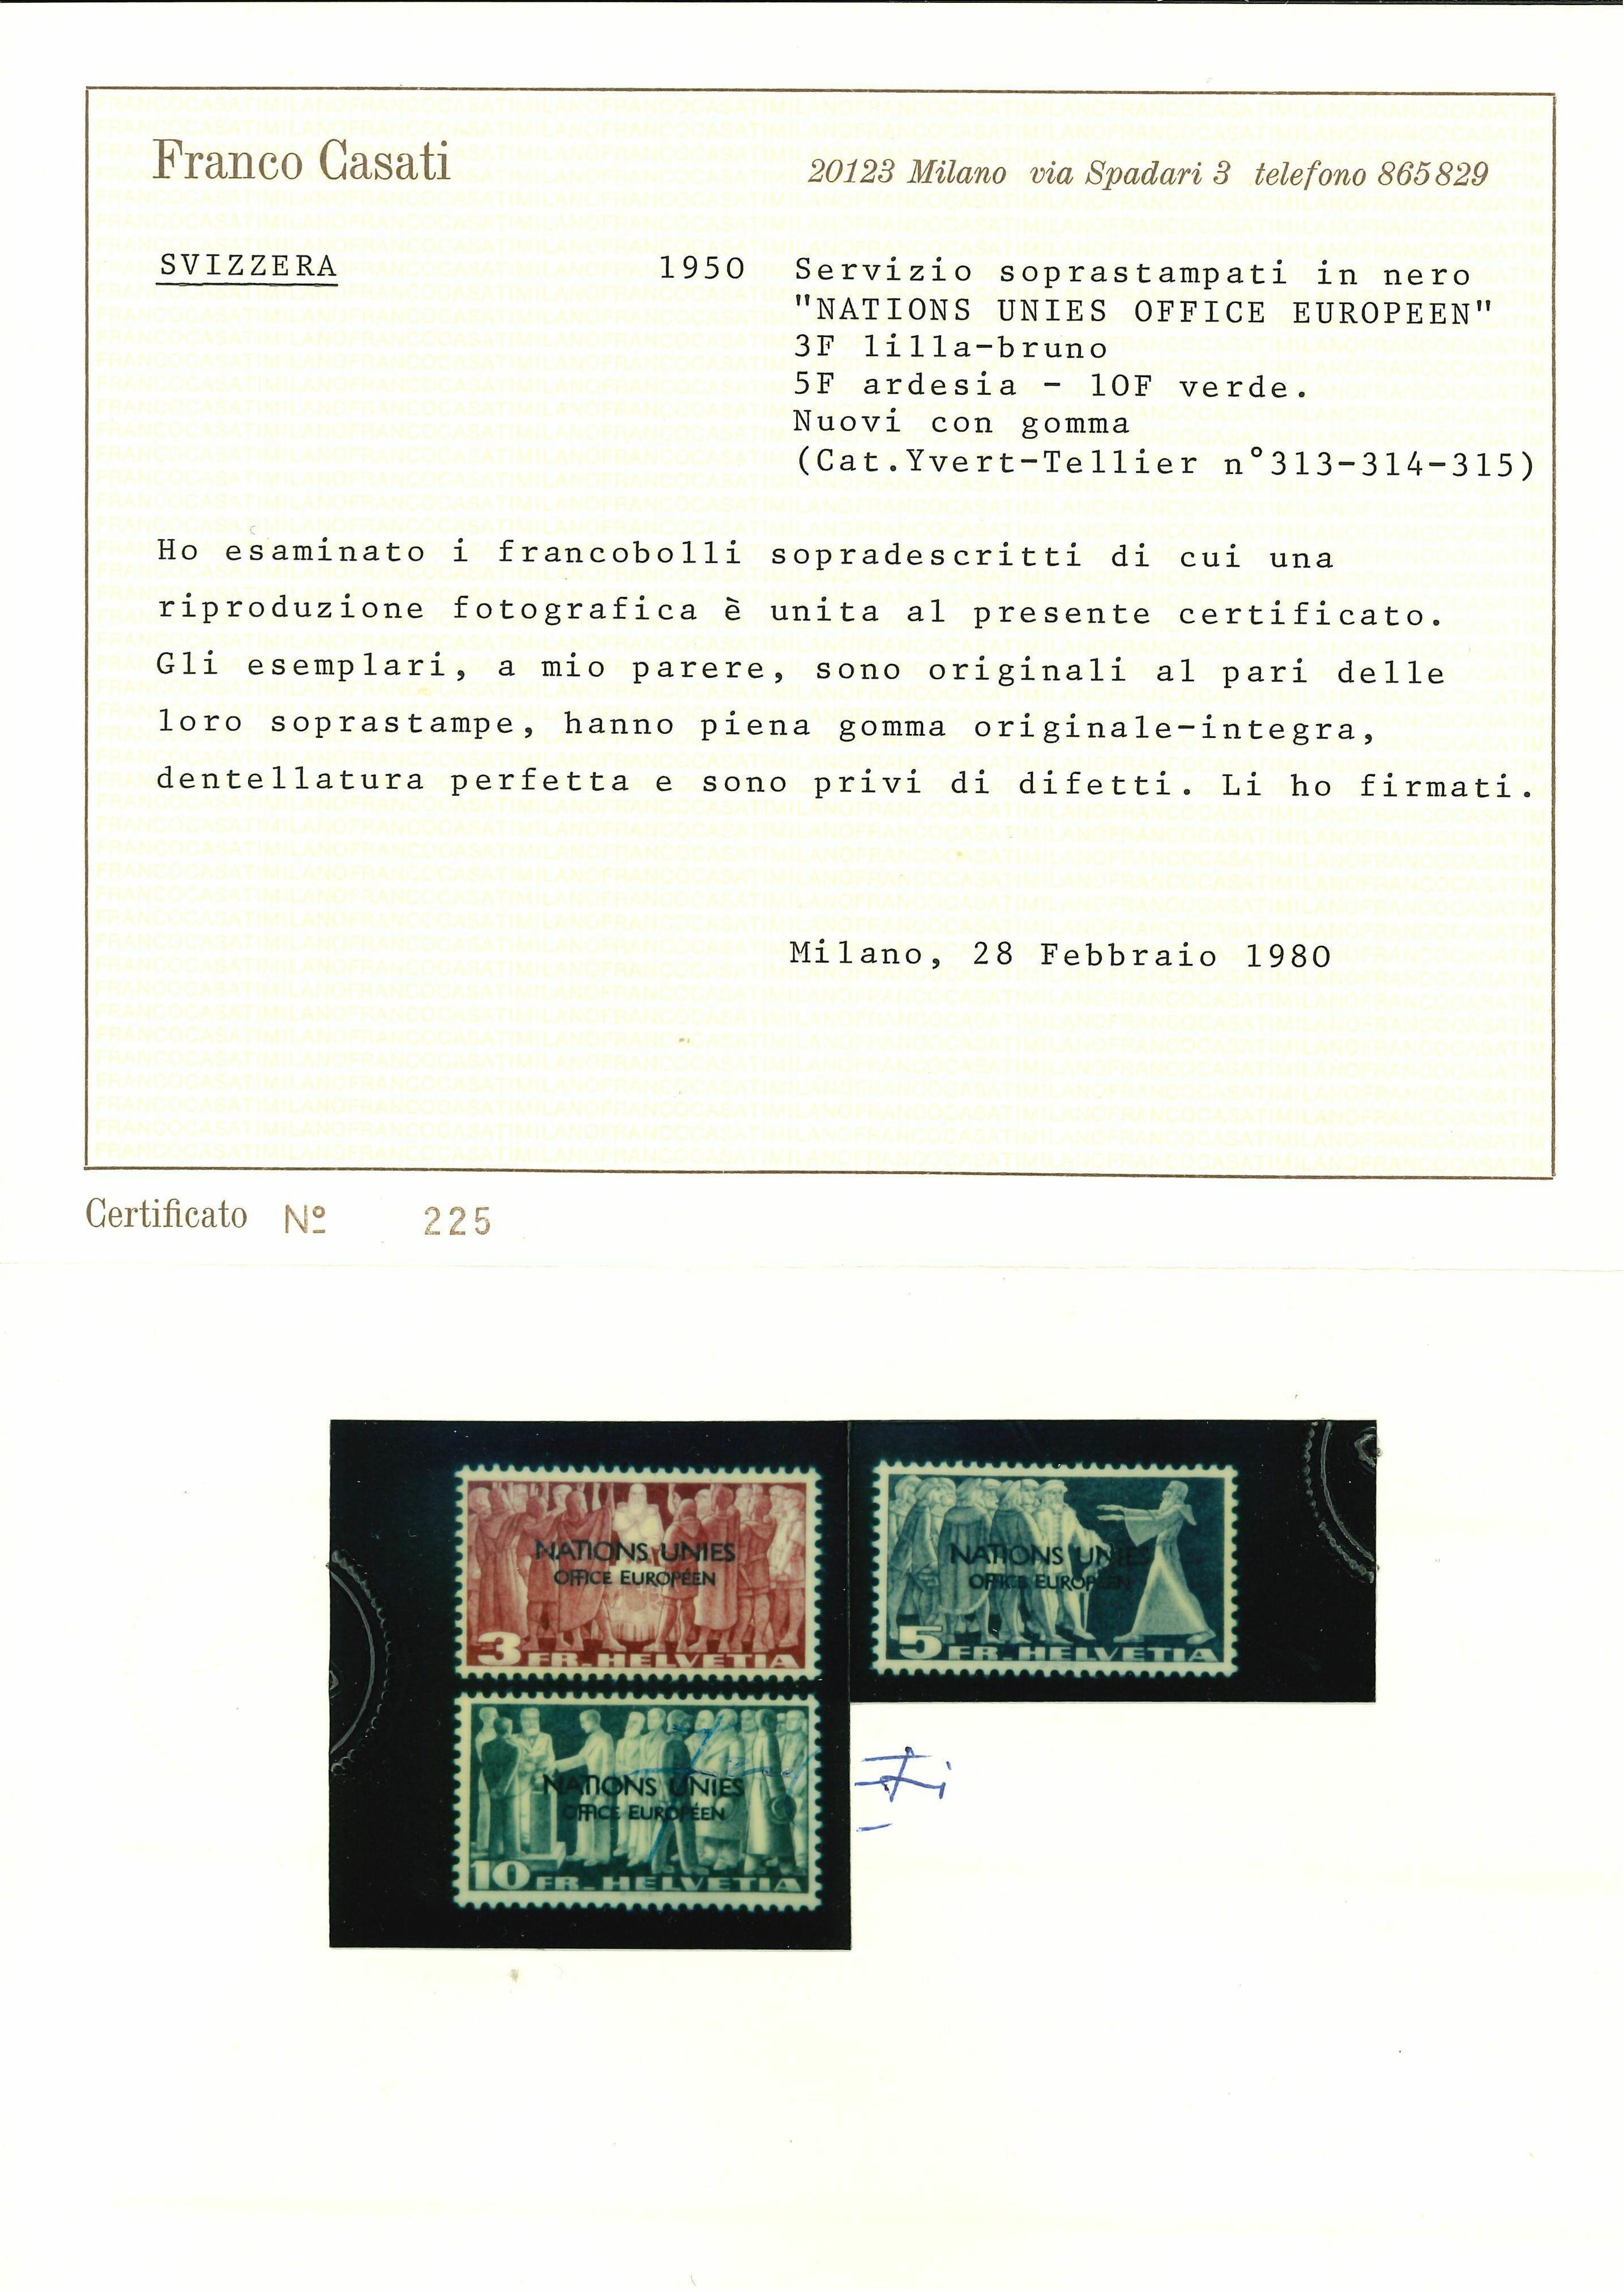 Lot 2480 - svizzera Individual lots -  Ponte Auction House Stamps Auction 505